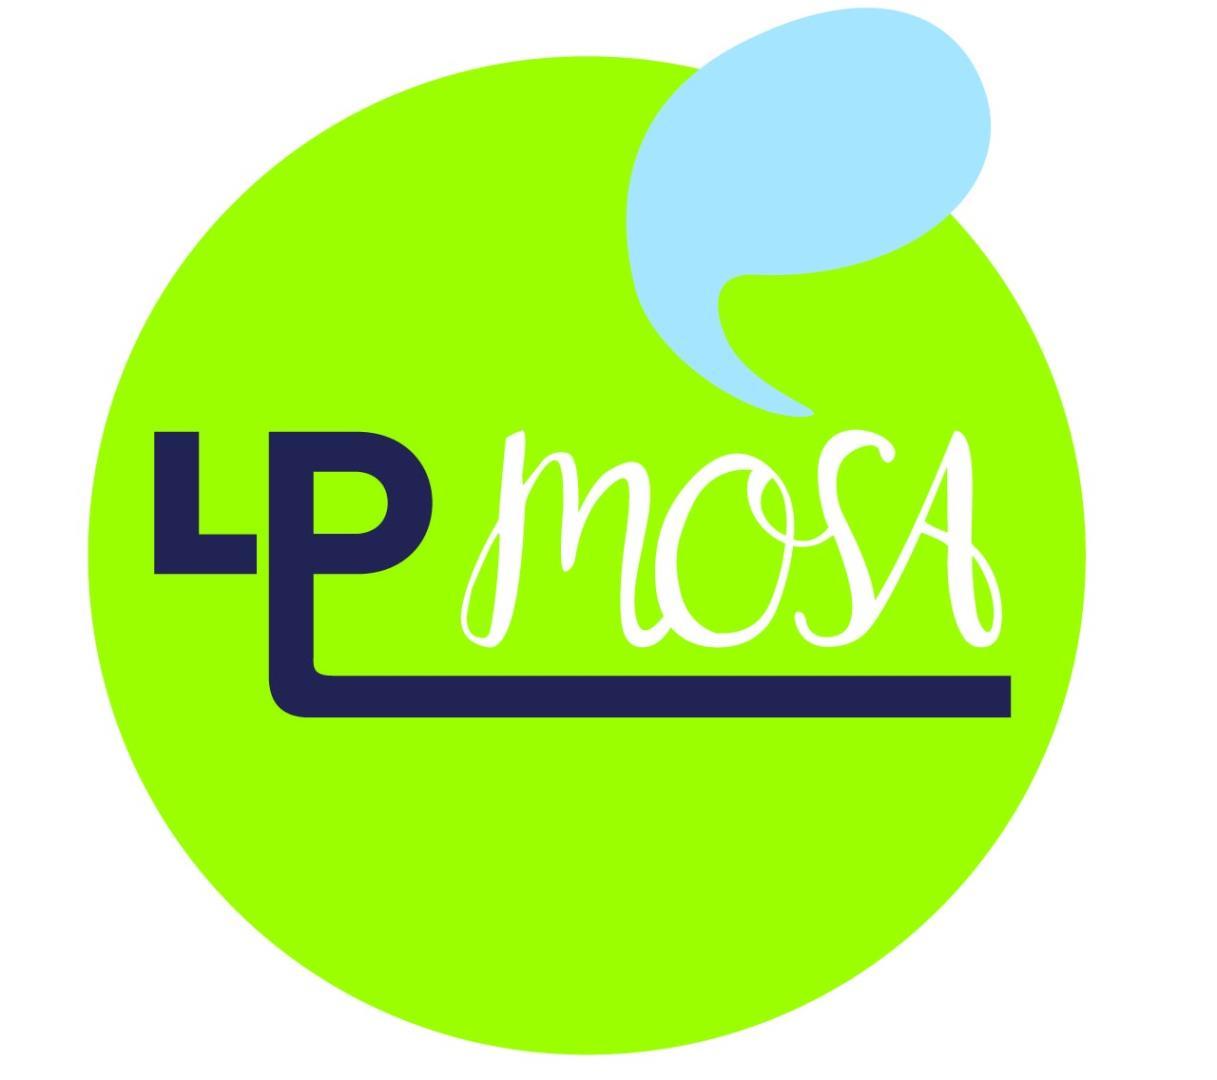 Association - Association Licence Professionnelle Associative